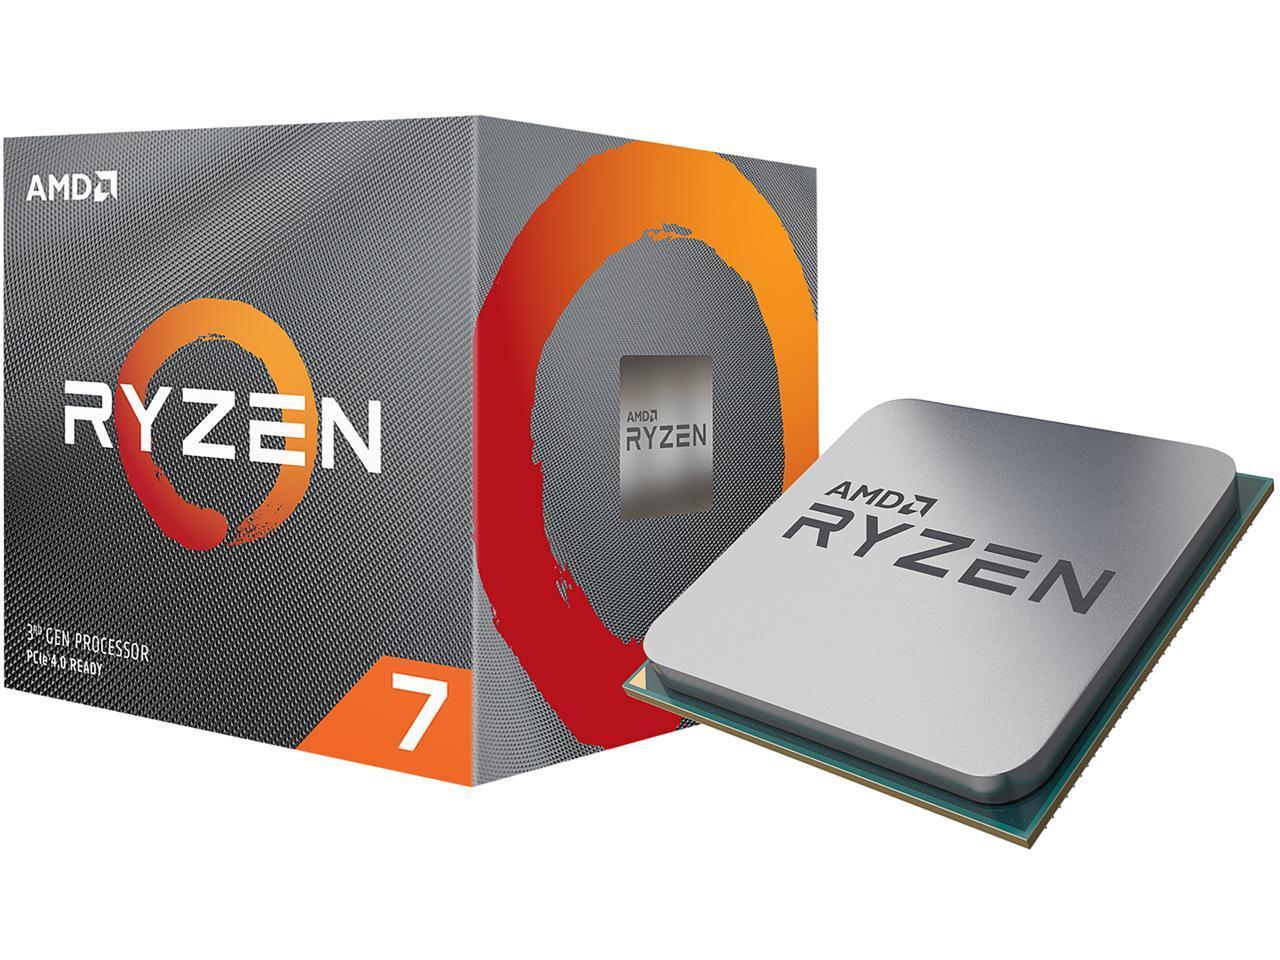 Amd Ryzen 7 3800x 8 Core 3 9 Ghz 4 5 Ghz Max Boost Socket Am4 105w 100 100000025box Desktop Processor Newegg Com